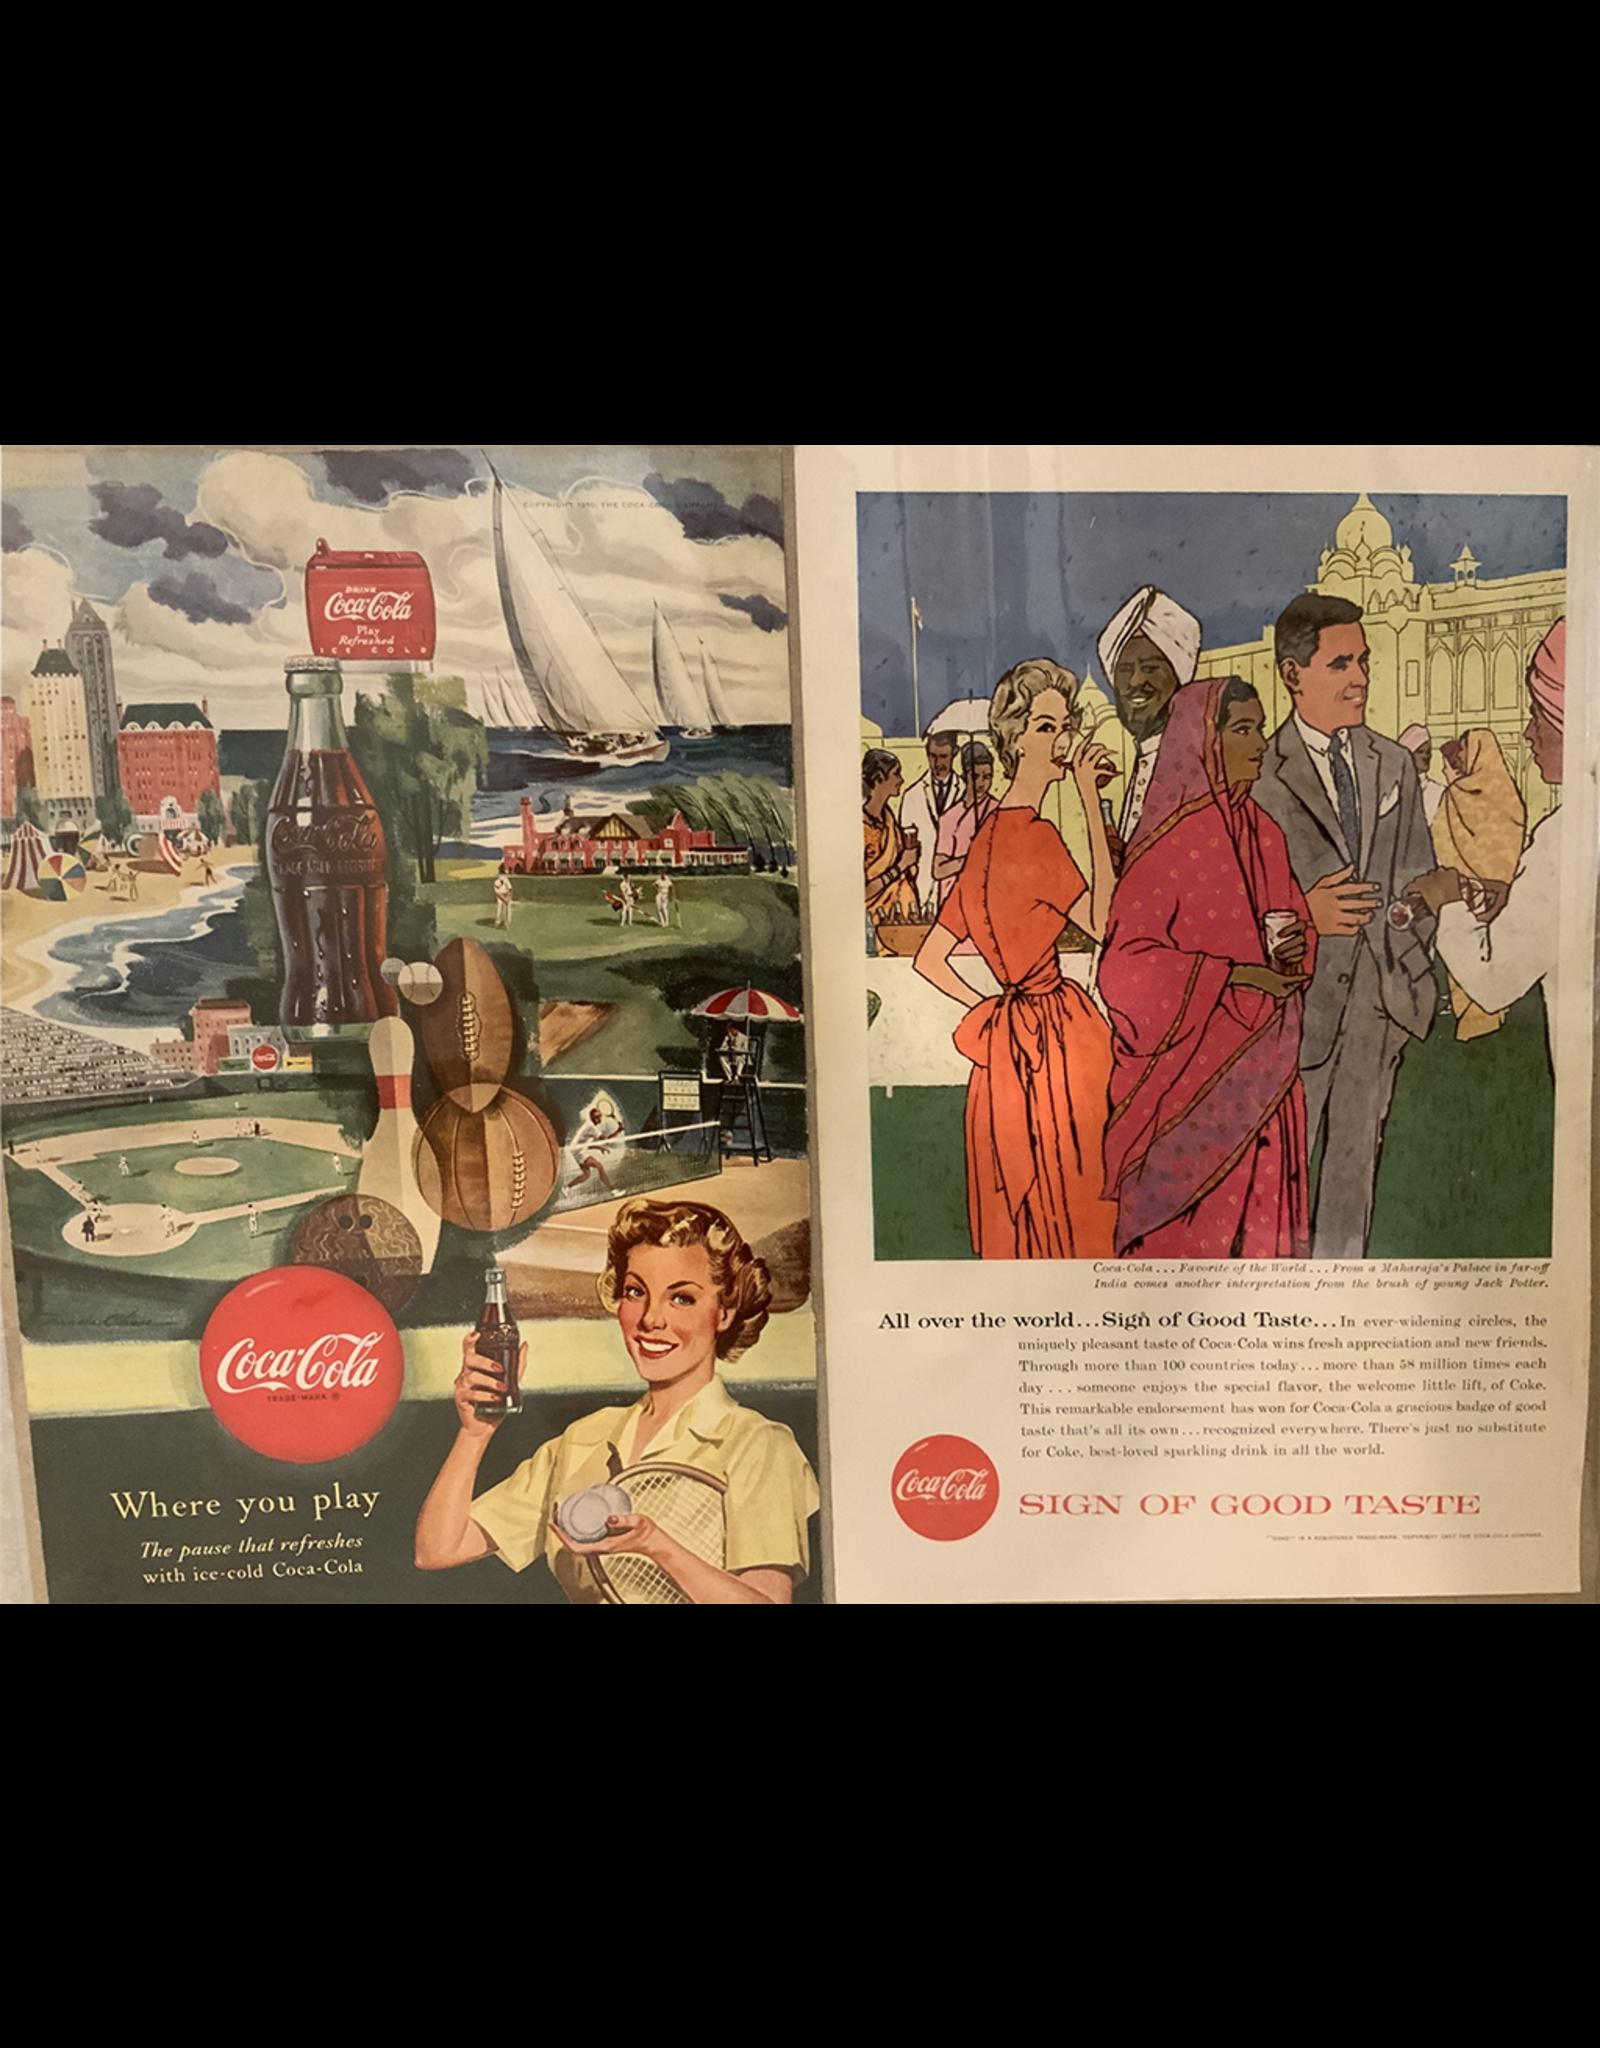 SPV 1950's Coca-Cola advertisement